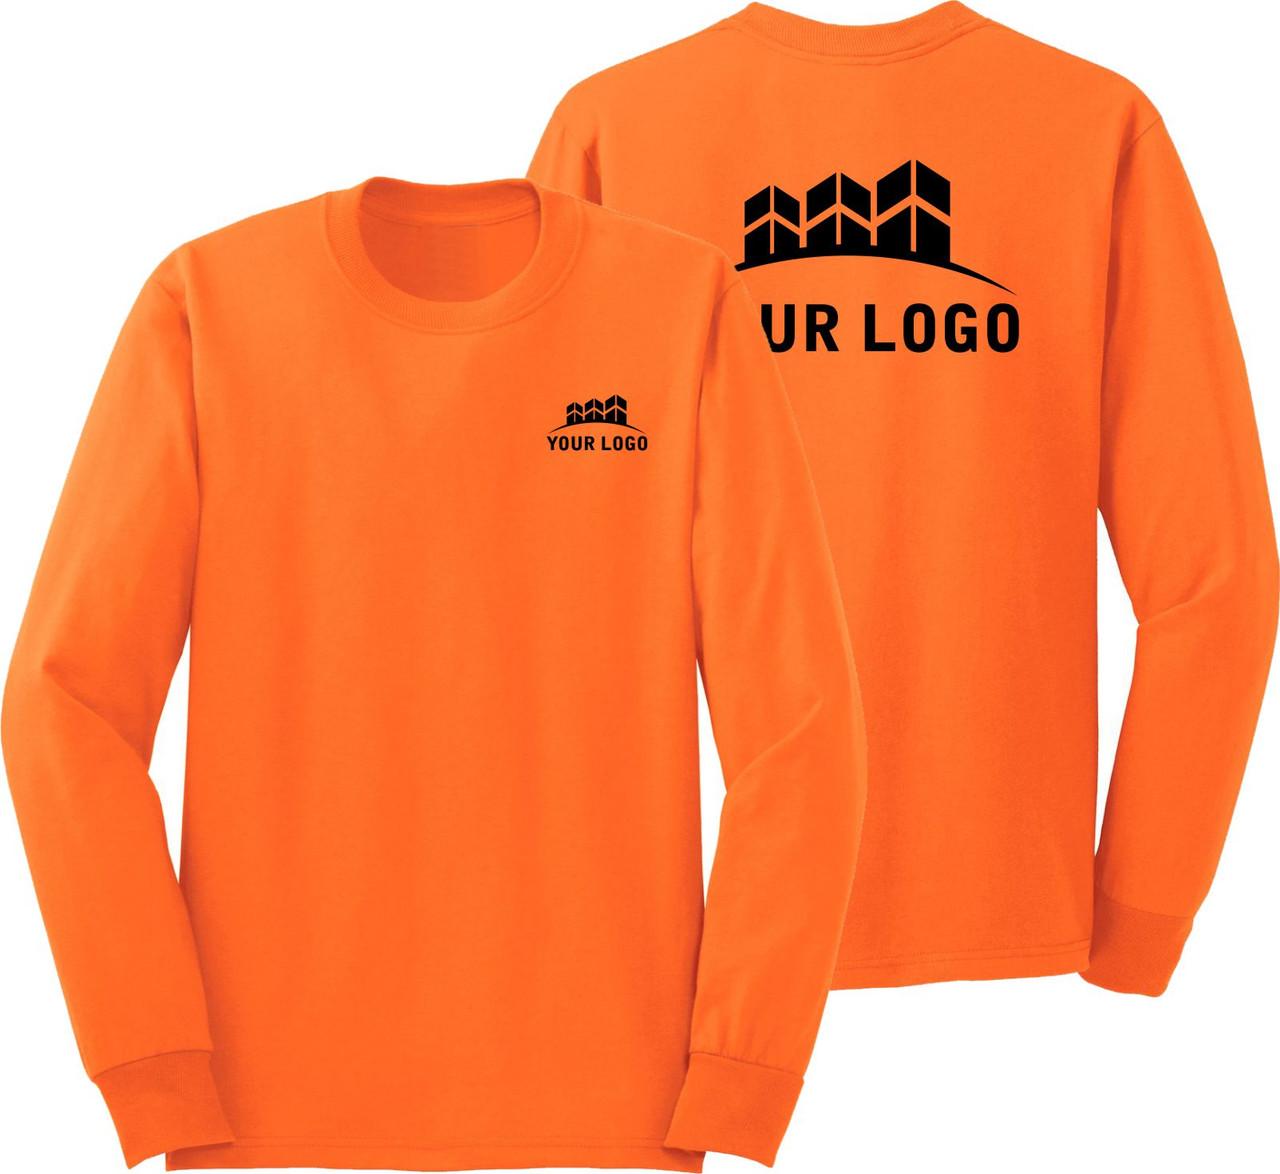 Long Sleeve Safety Orange Shirt with Logo | Custom High Visibility T-Shirt | Custom Long Seeve Construction Safety Shirt